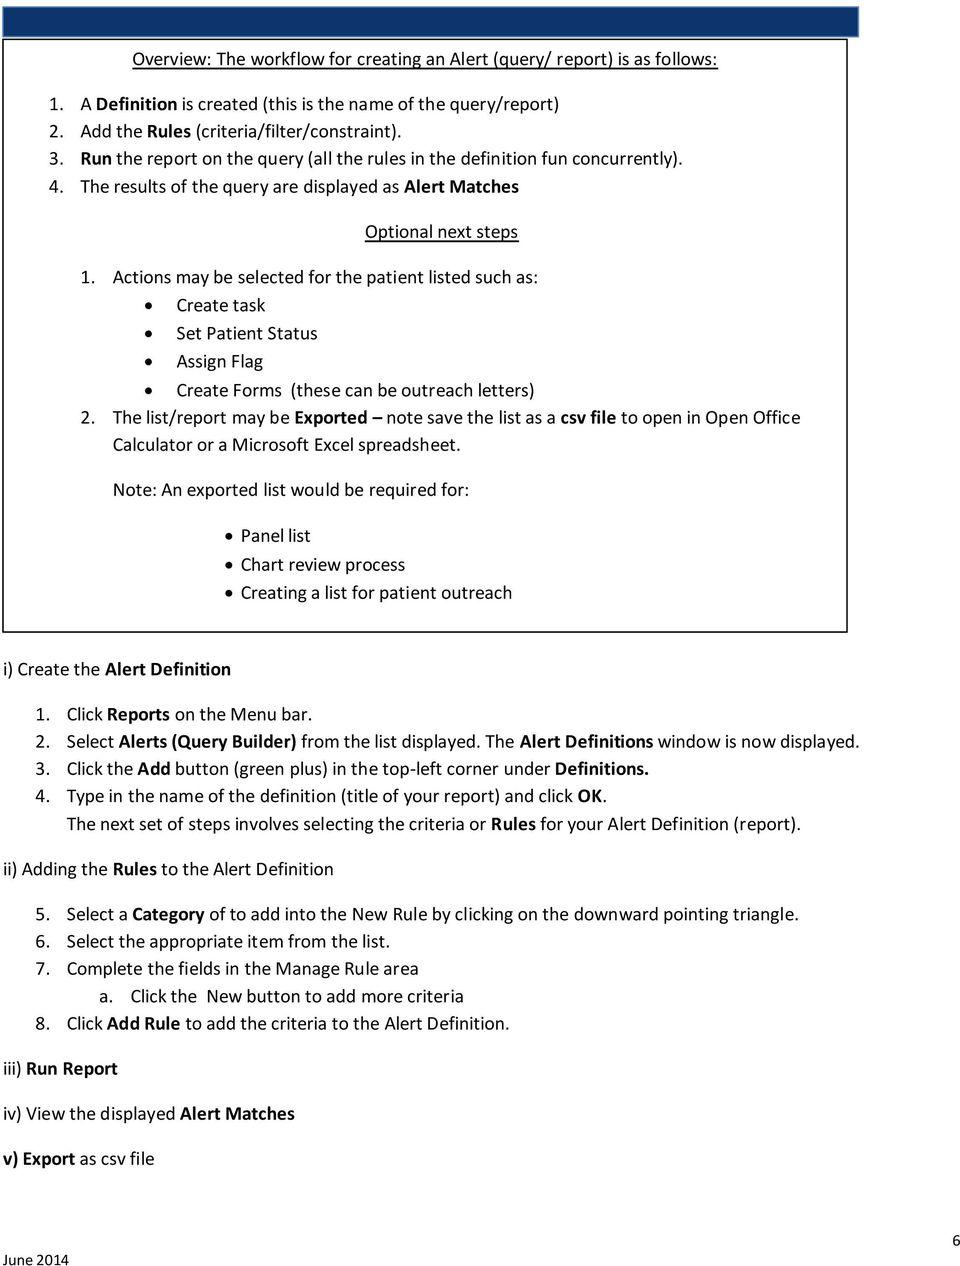 Definition Spreadsheet Software